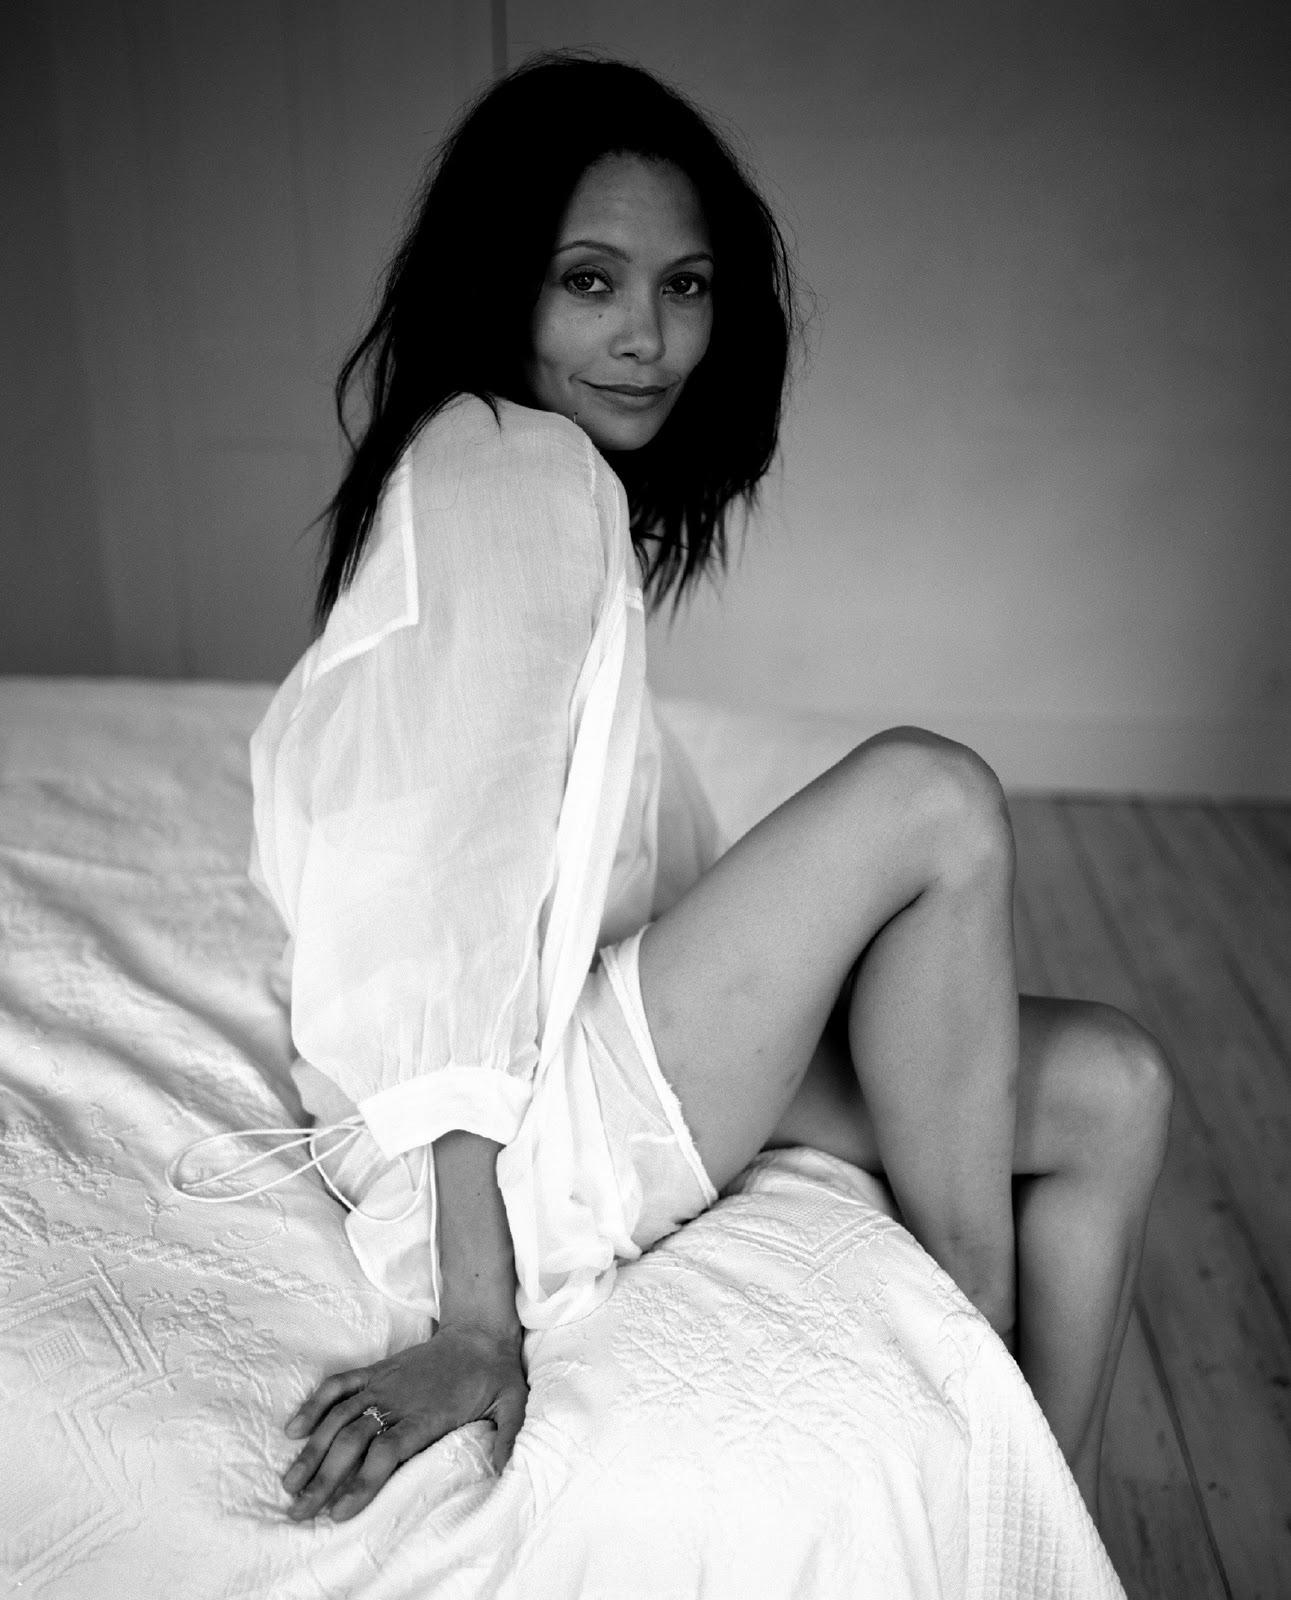 Hot Thandie Newton nudes (46 foto and video), Sexy, Paparazzi, Instagram, in bikini 2006